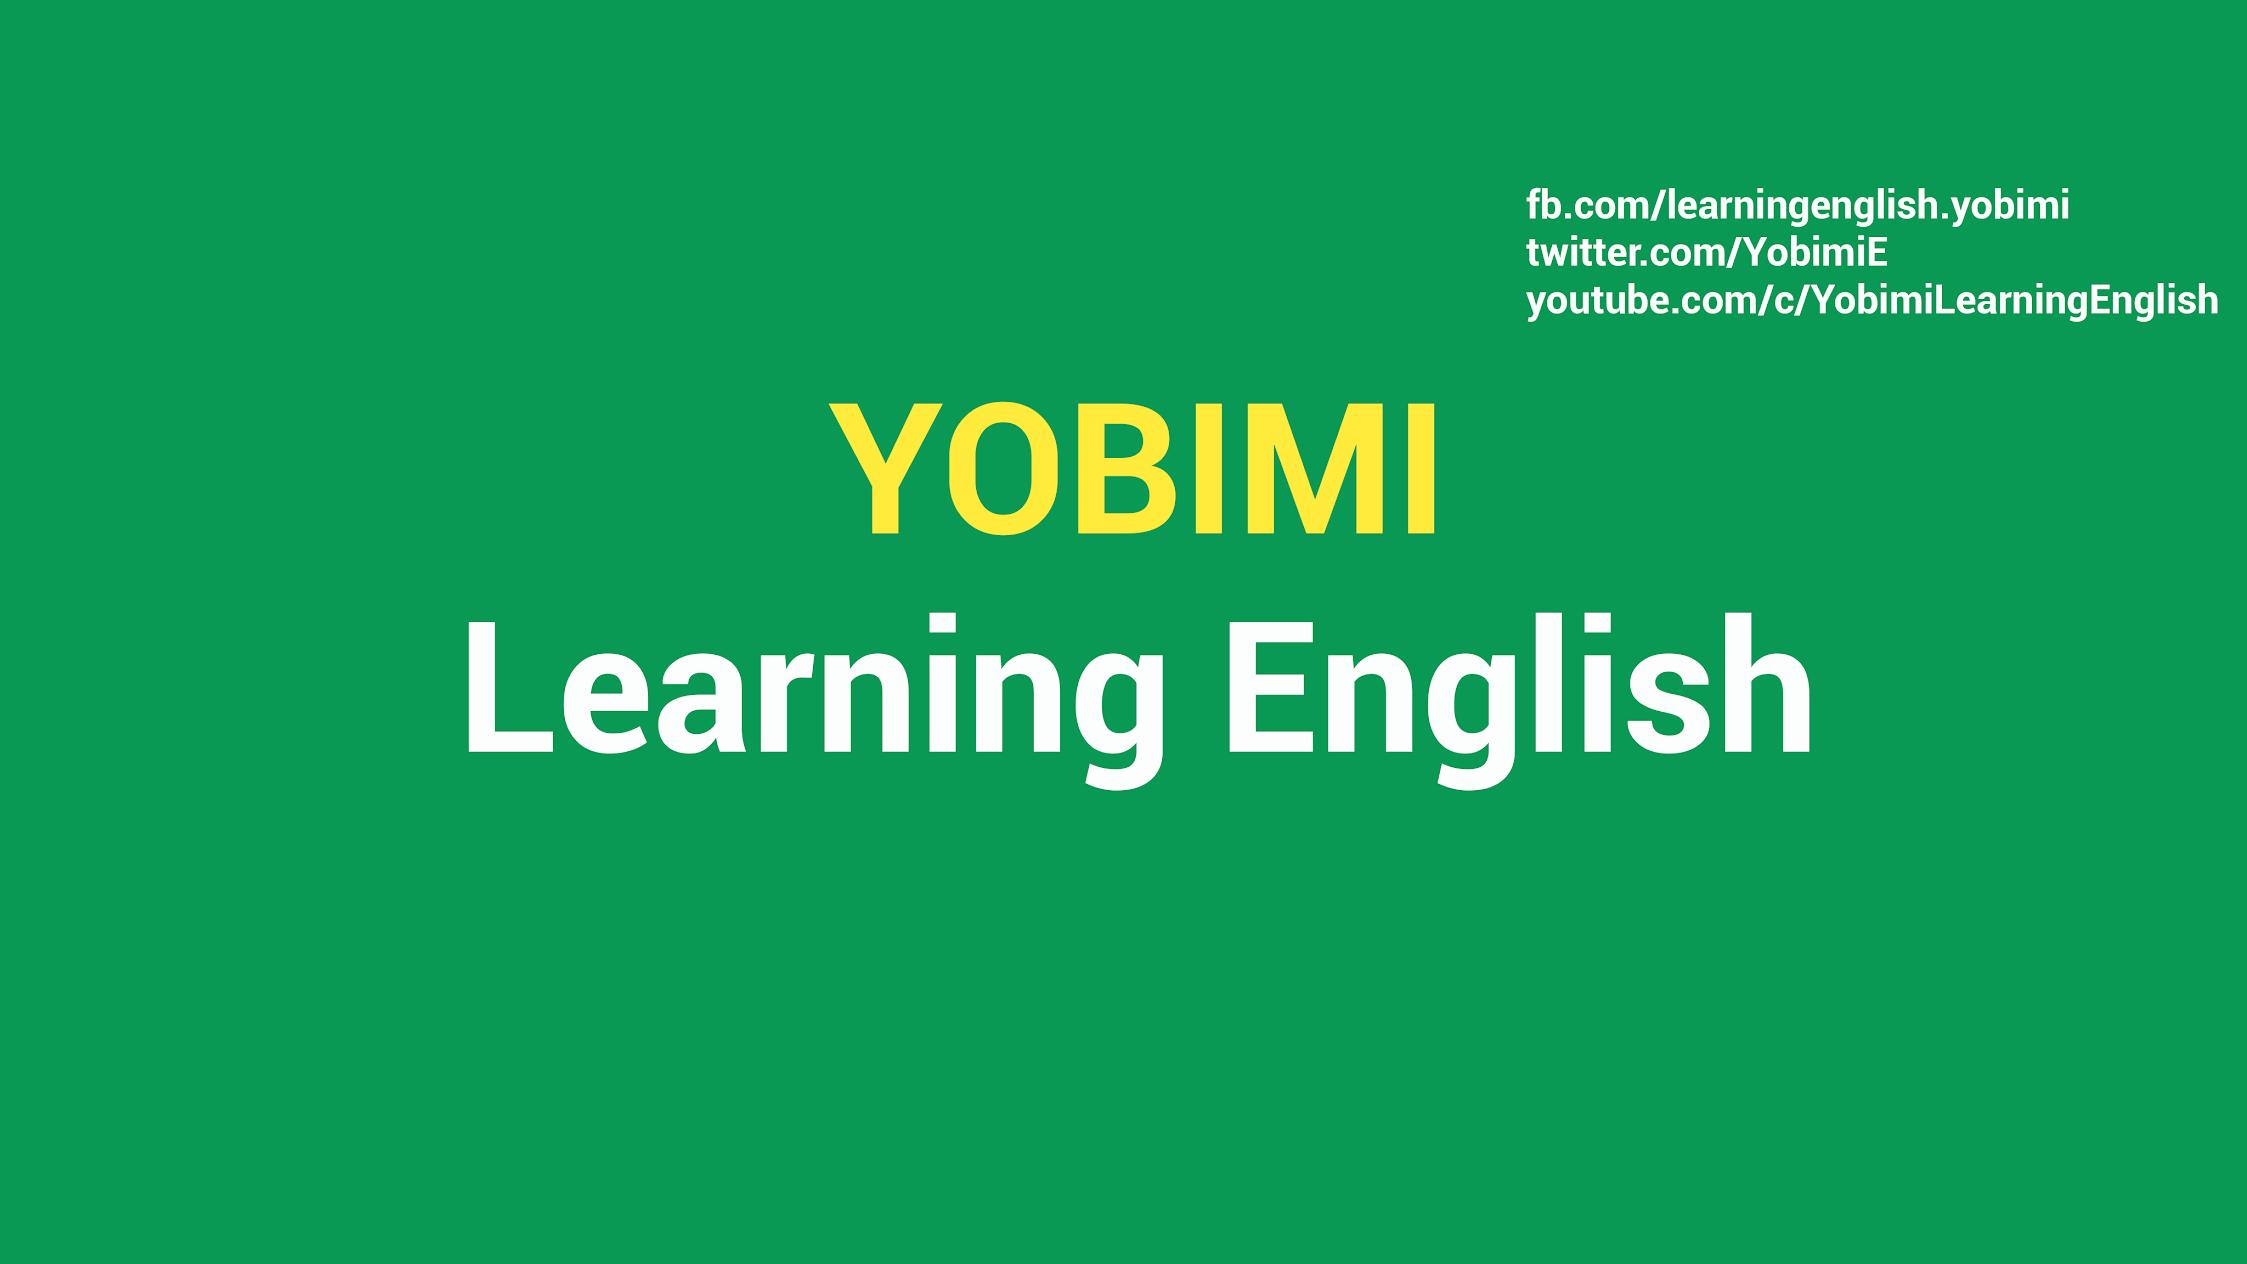 Yobimi Learning English Group